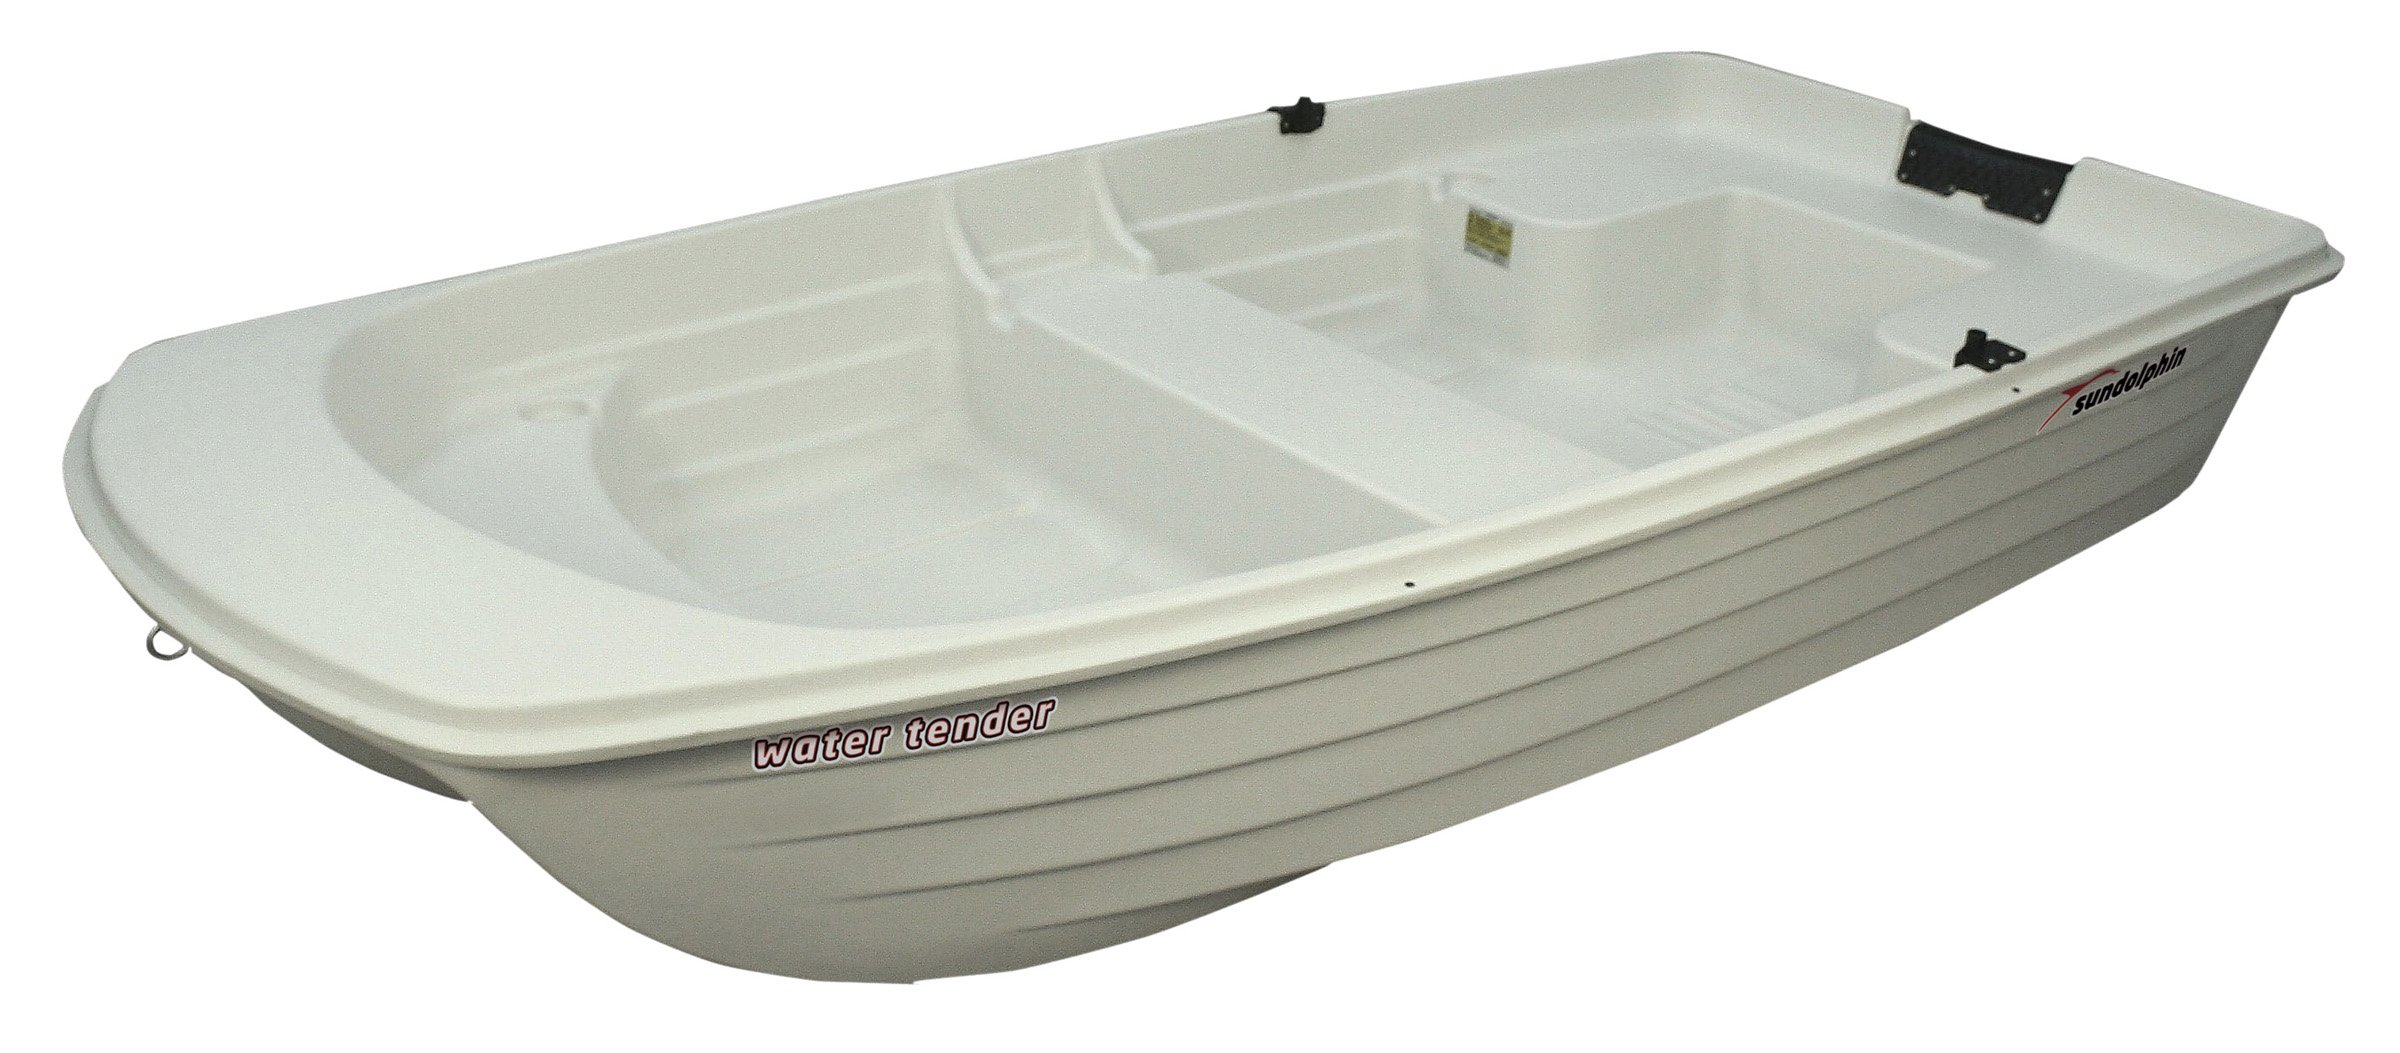 Sun Dolphin Water Tender Row Boat (White, 9.4-Feet)